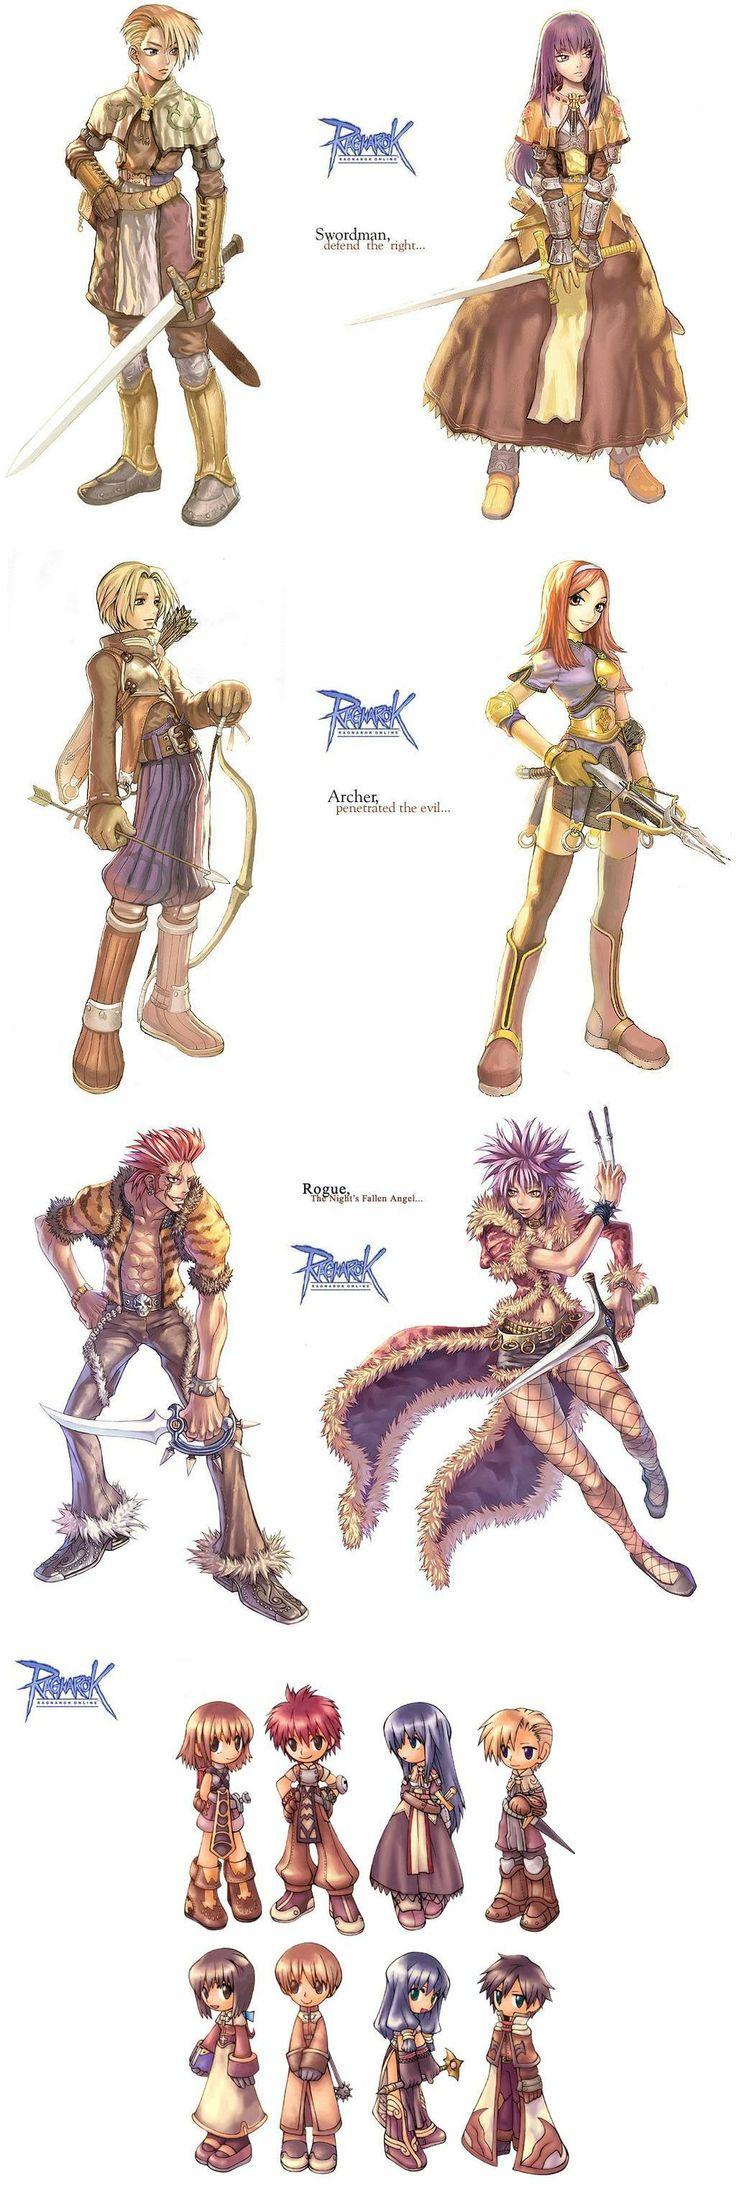 Game Anime Character Design Book : Ragnarok online favorite video games pinterest